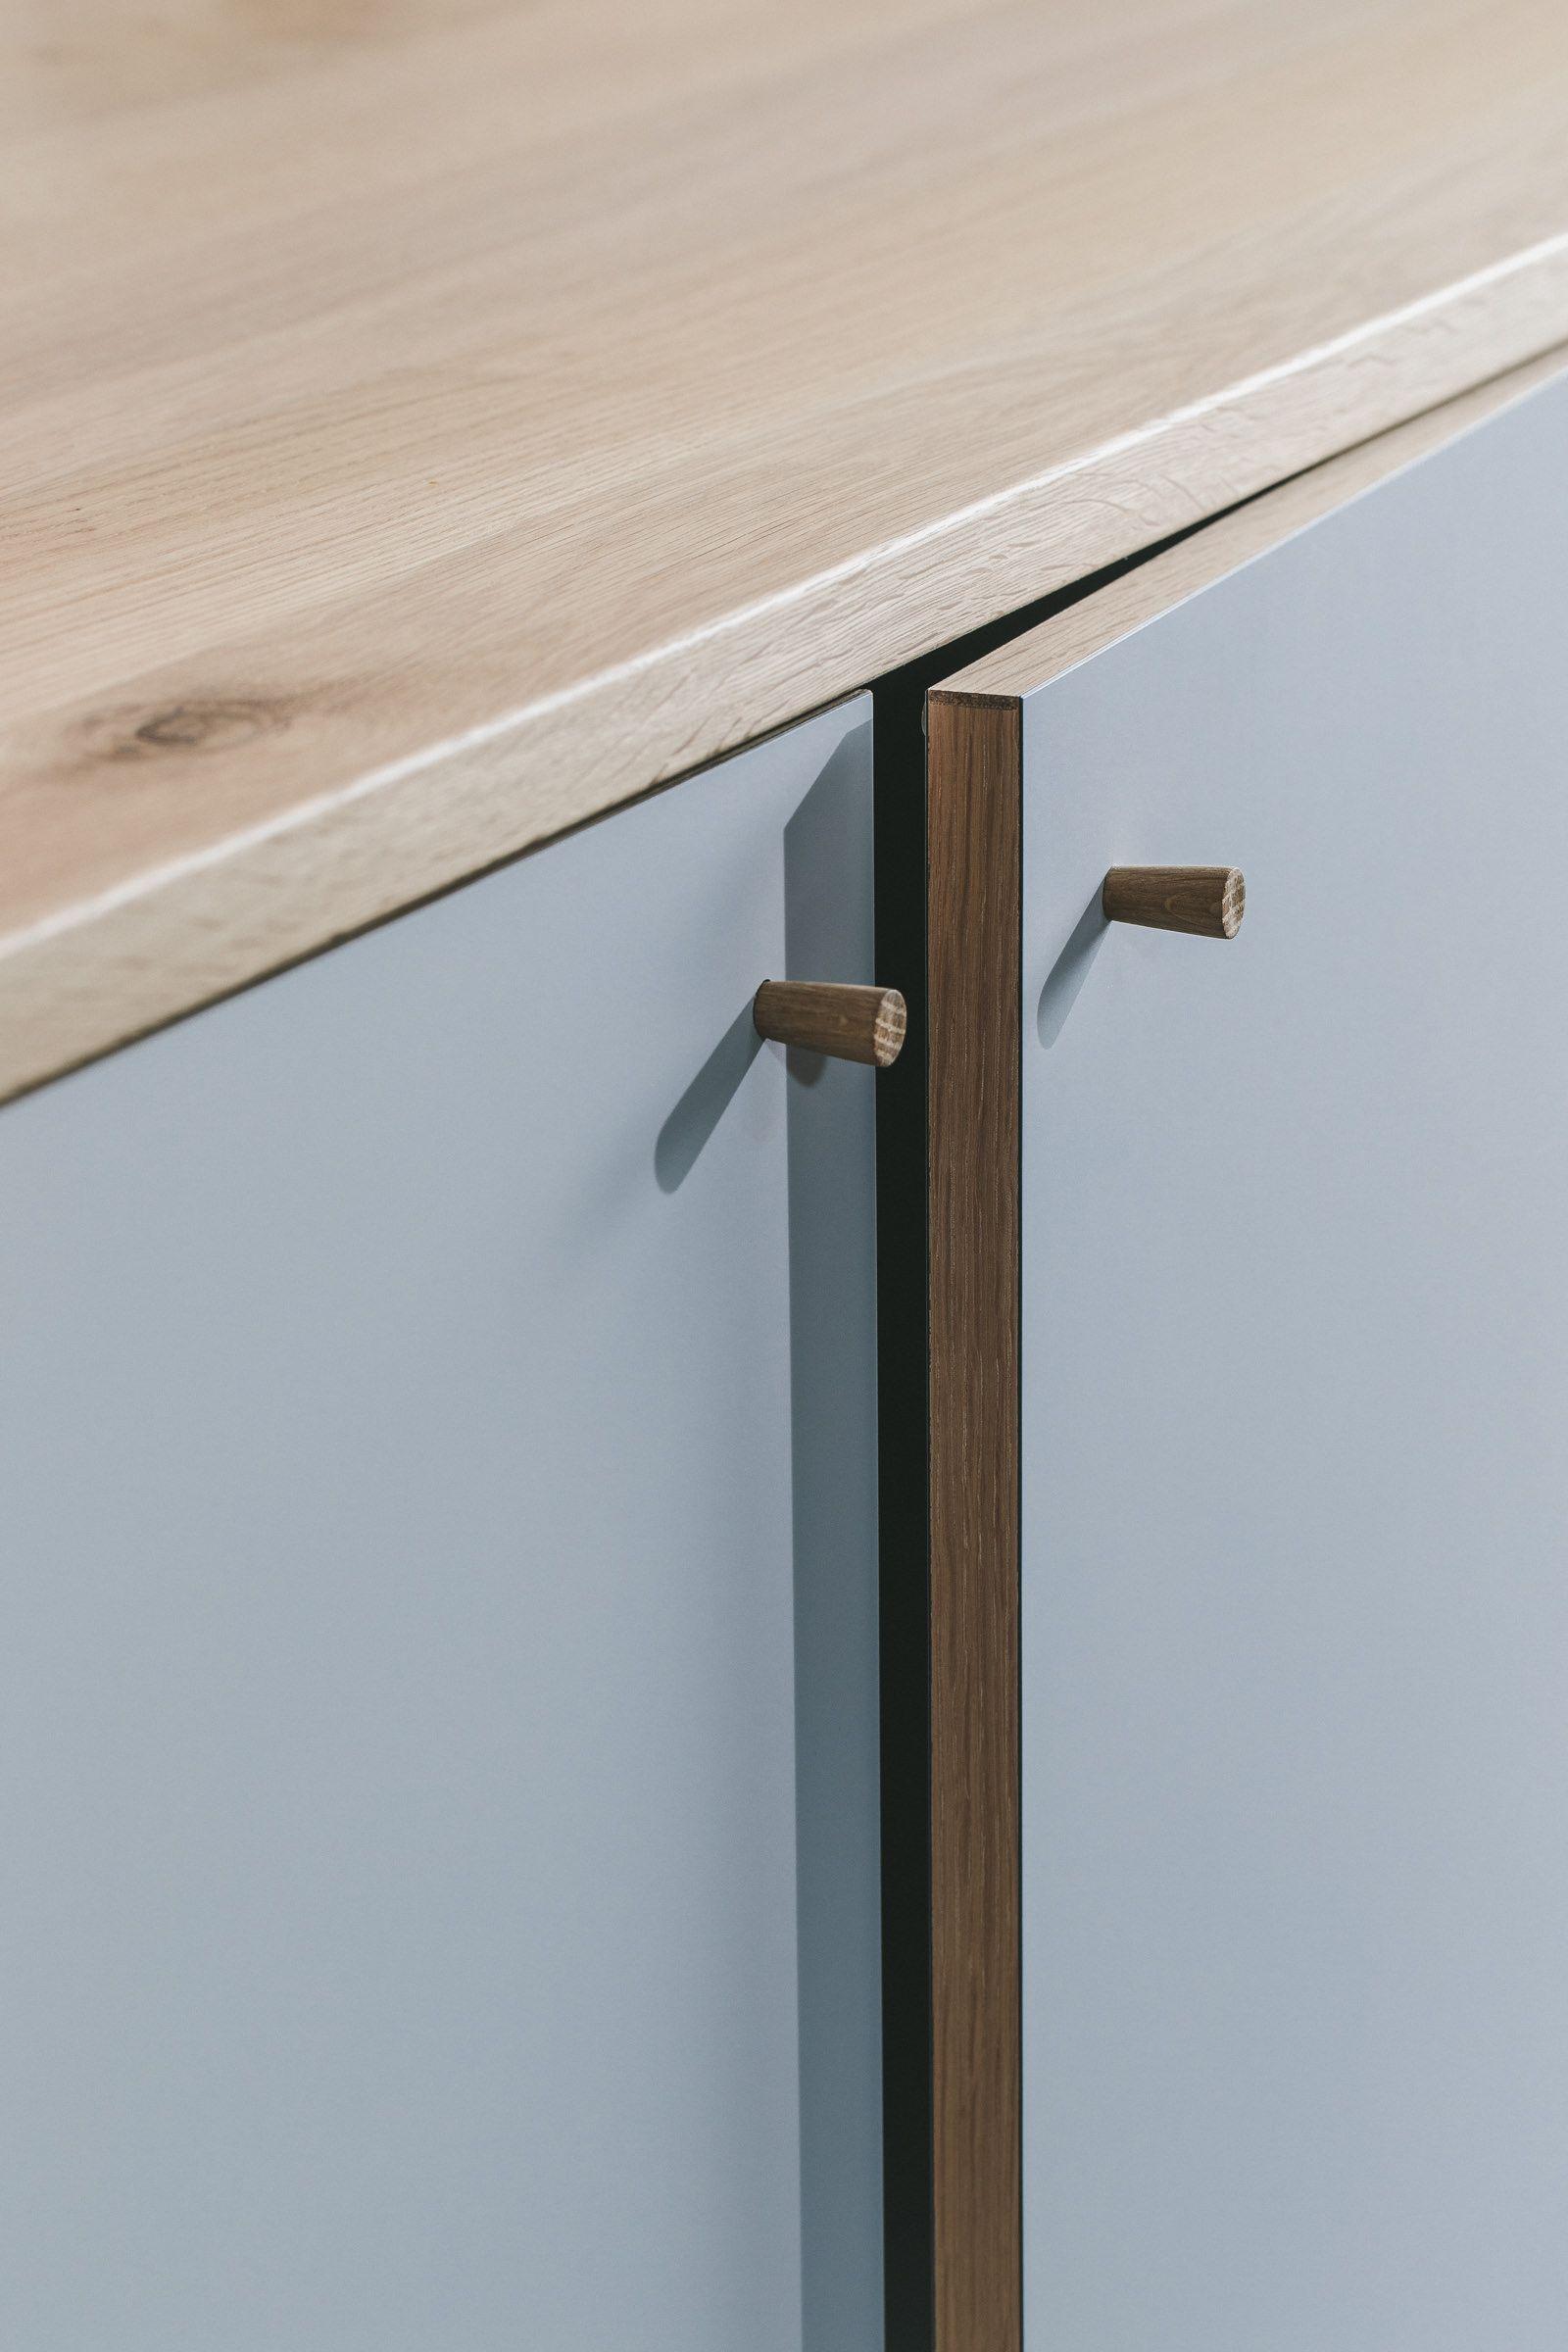 Solid Oak Lipped Door Edge With Oak Worktop And Hand Turned Handles Husk Kitchens Bristol Furniture Design Door Handles Howdens Kitchens